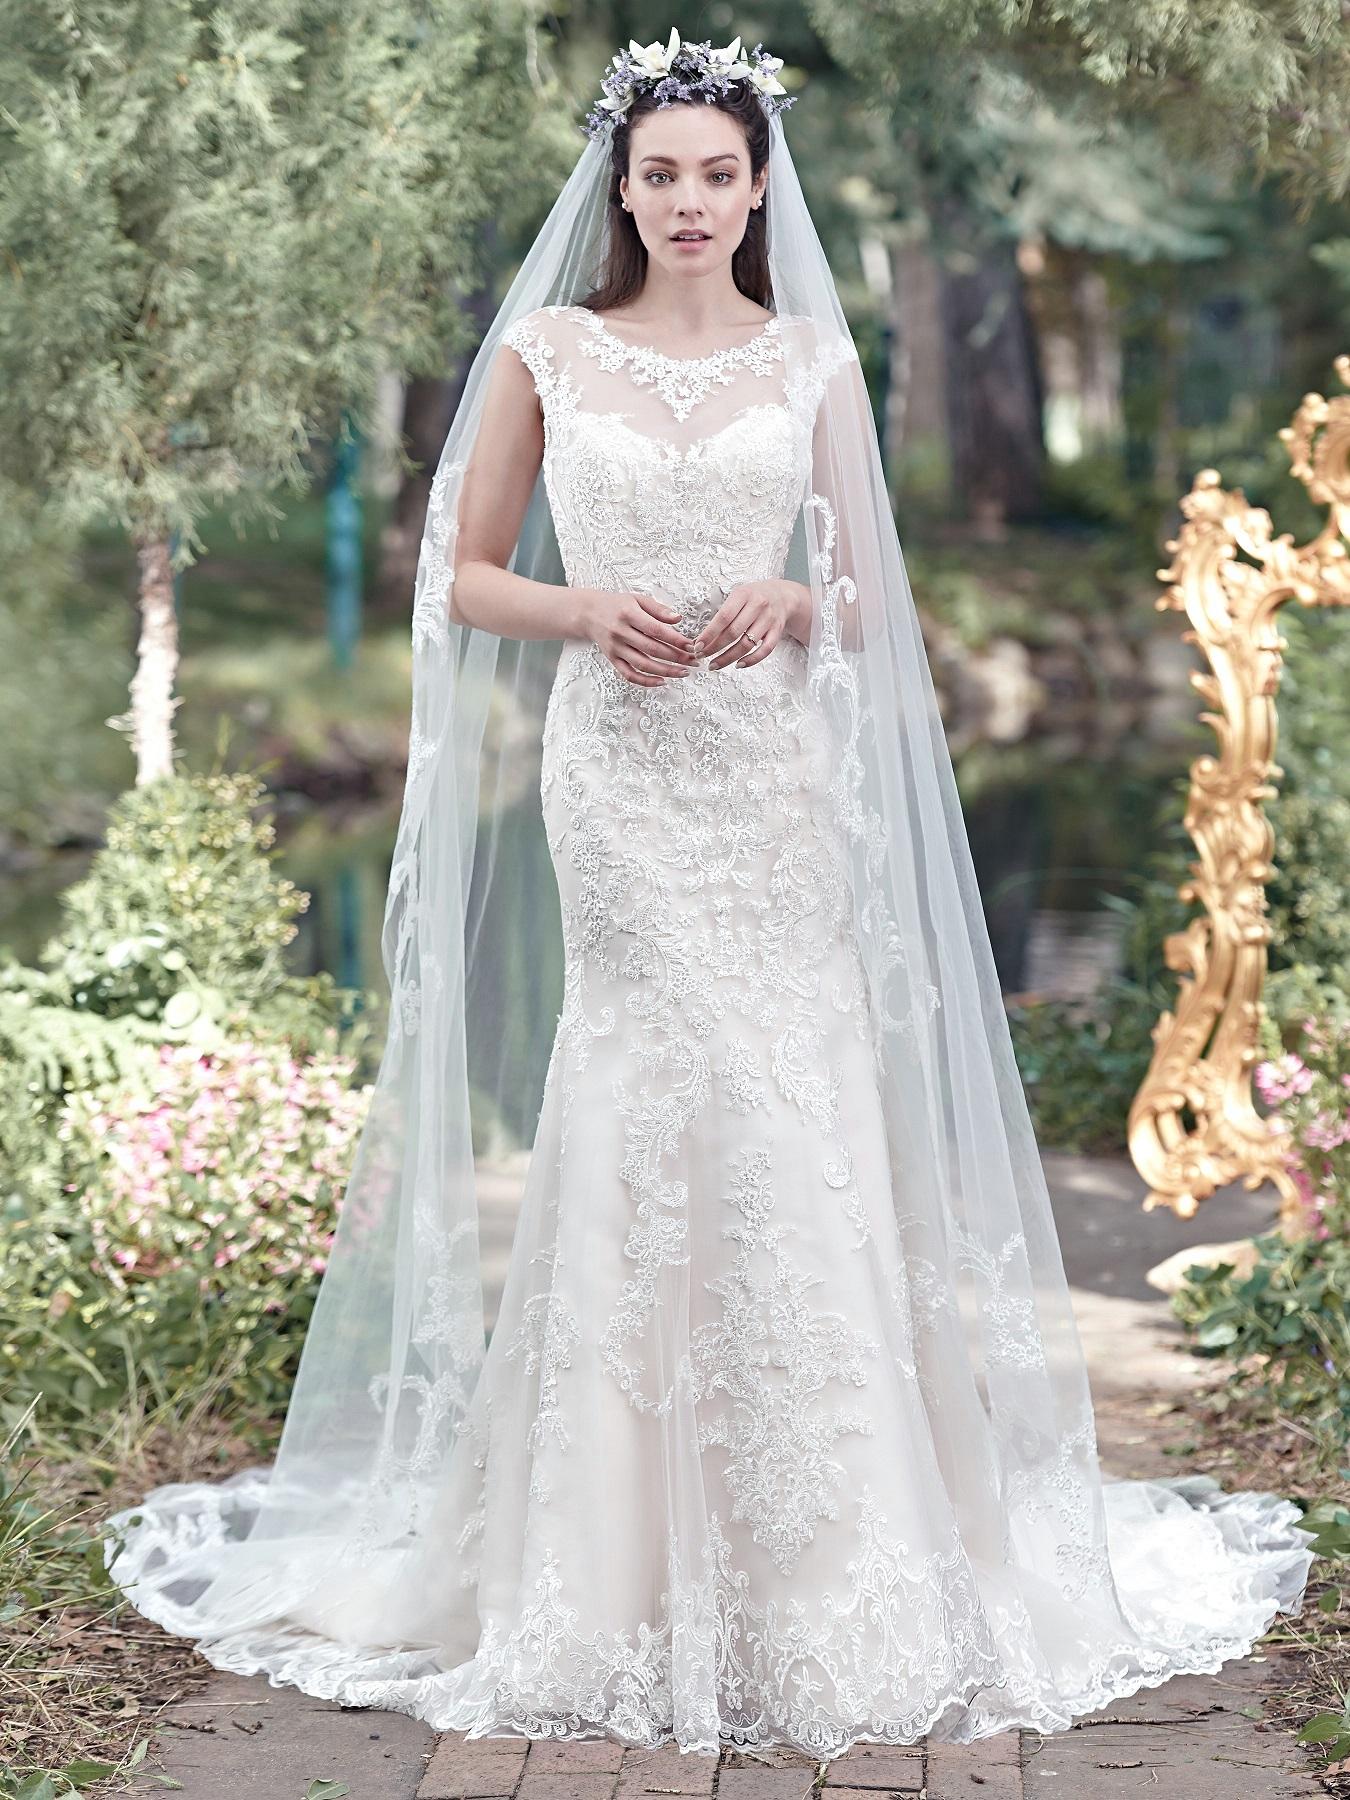 Esküvői jelképek - MentŐ Mentáliroda